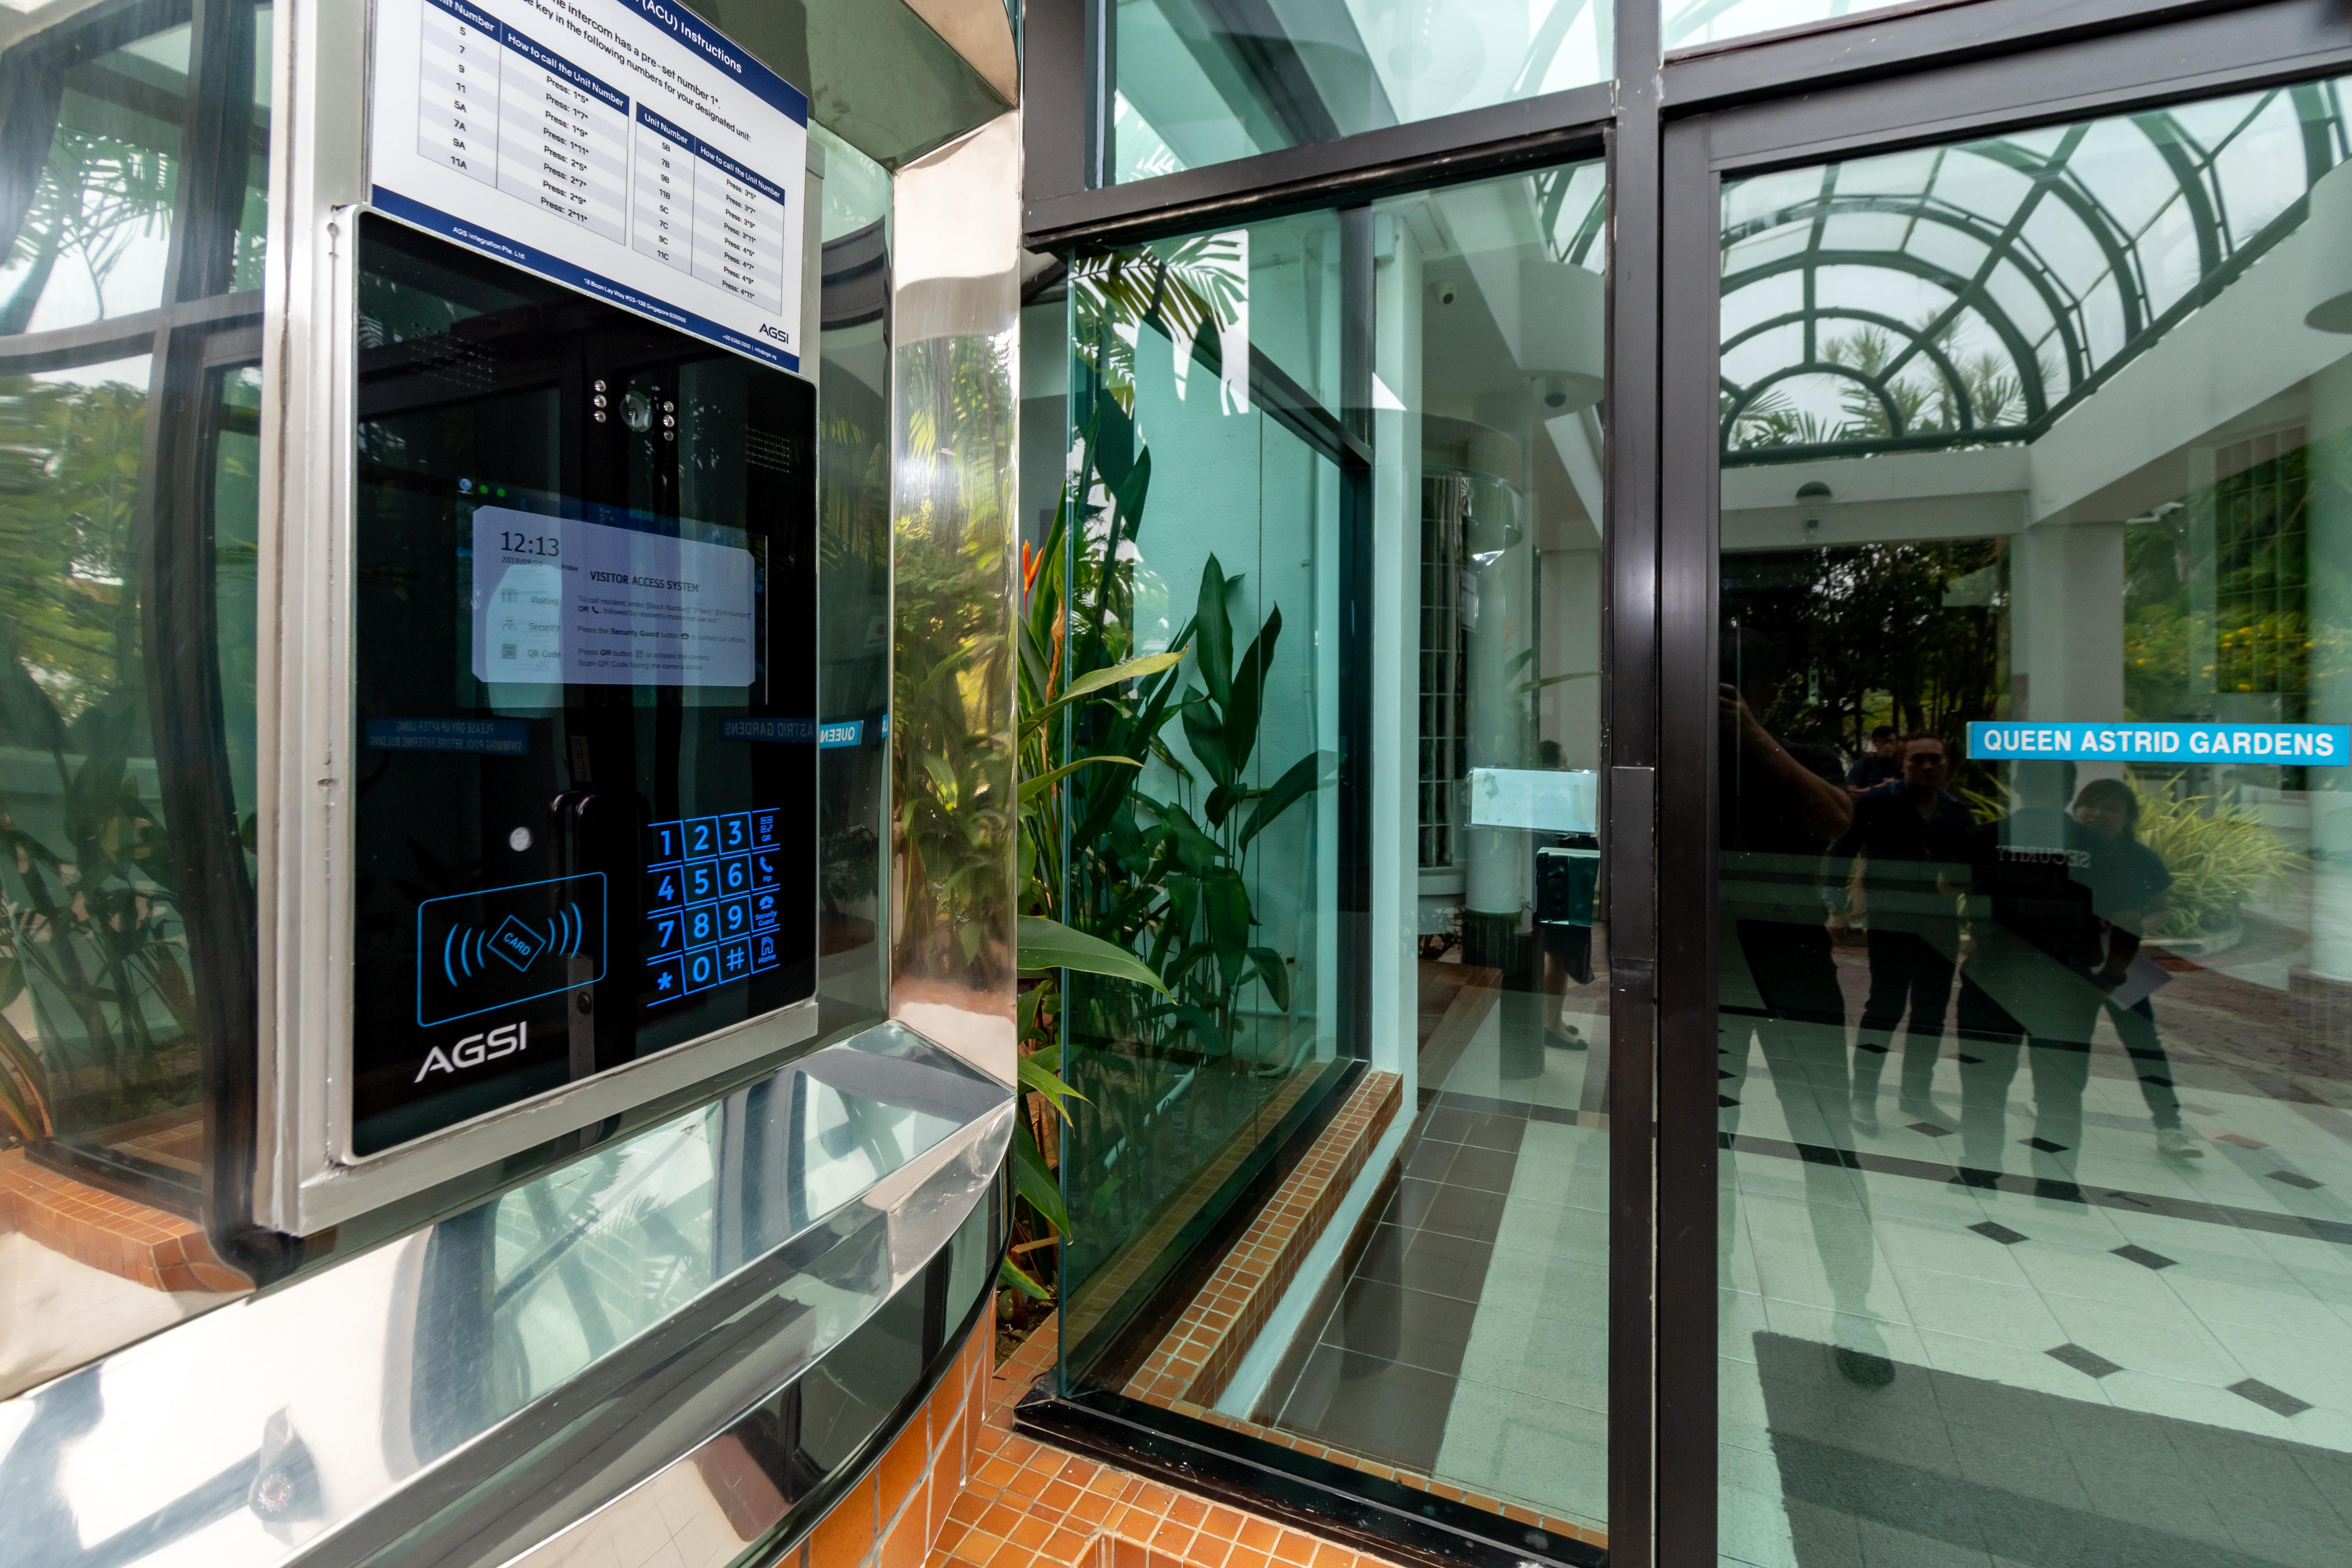 Smart Intercom System